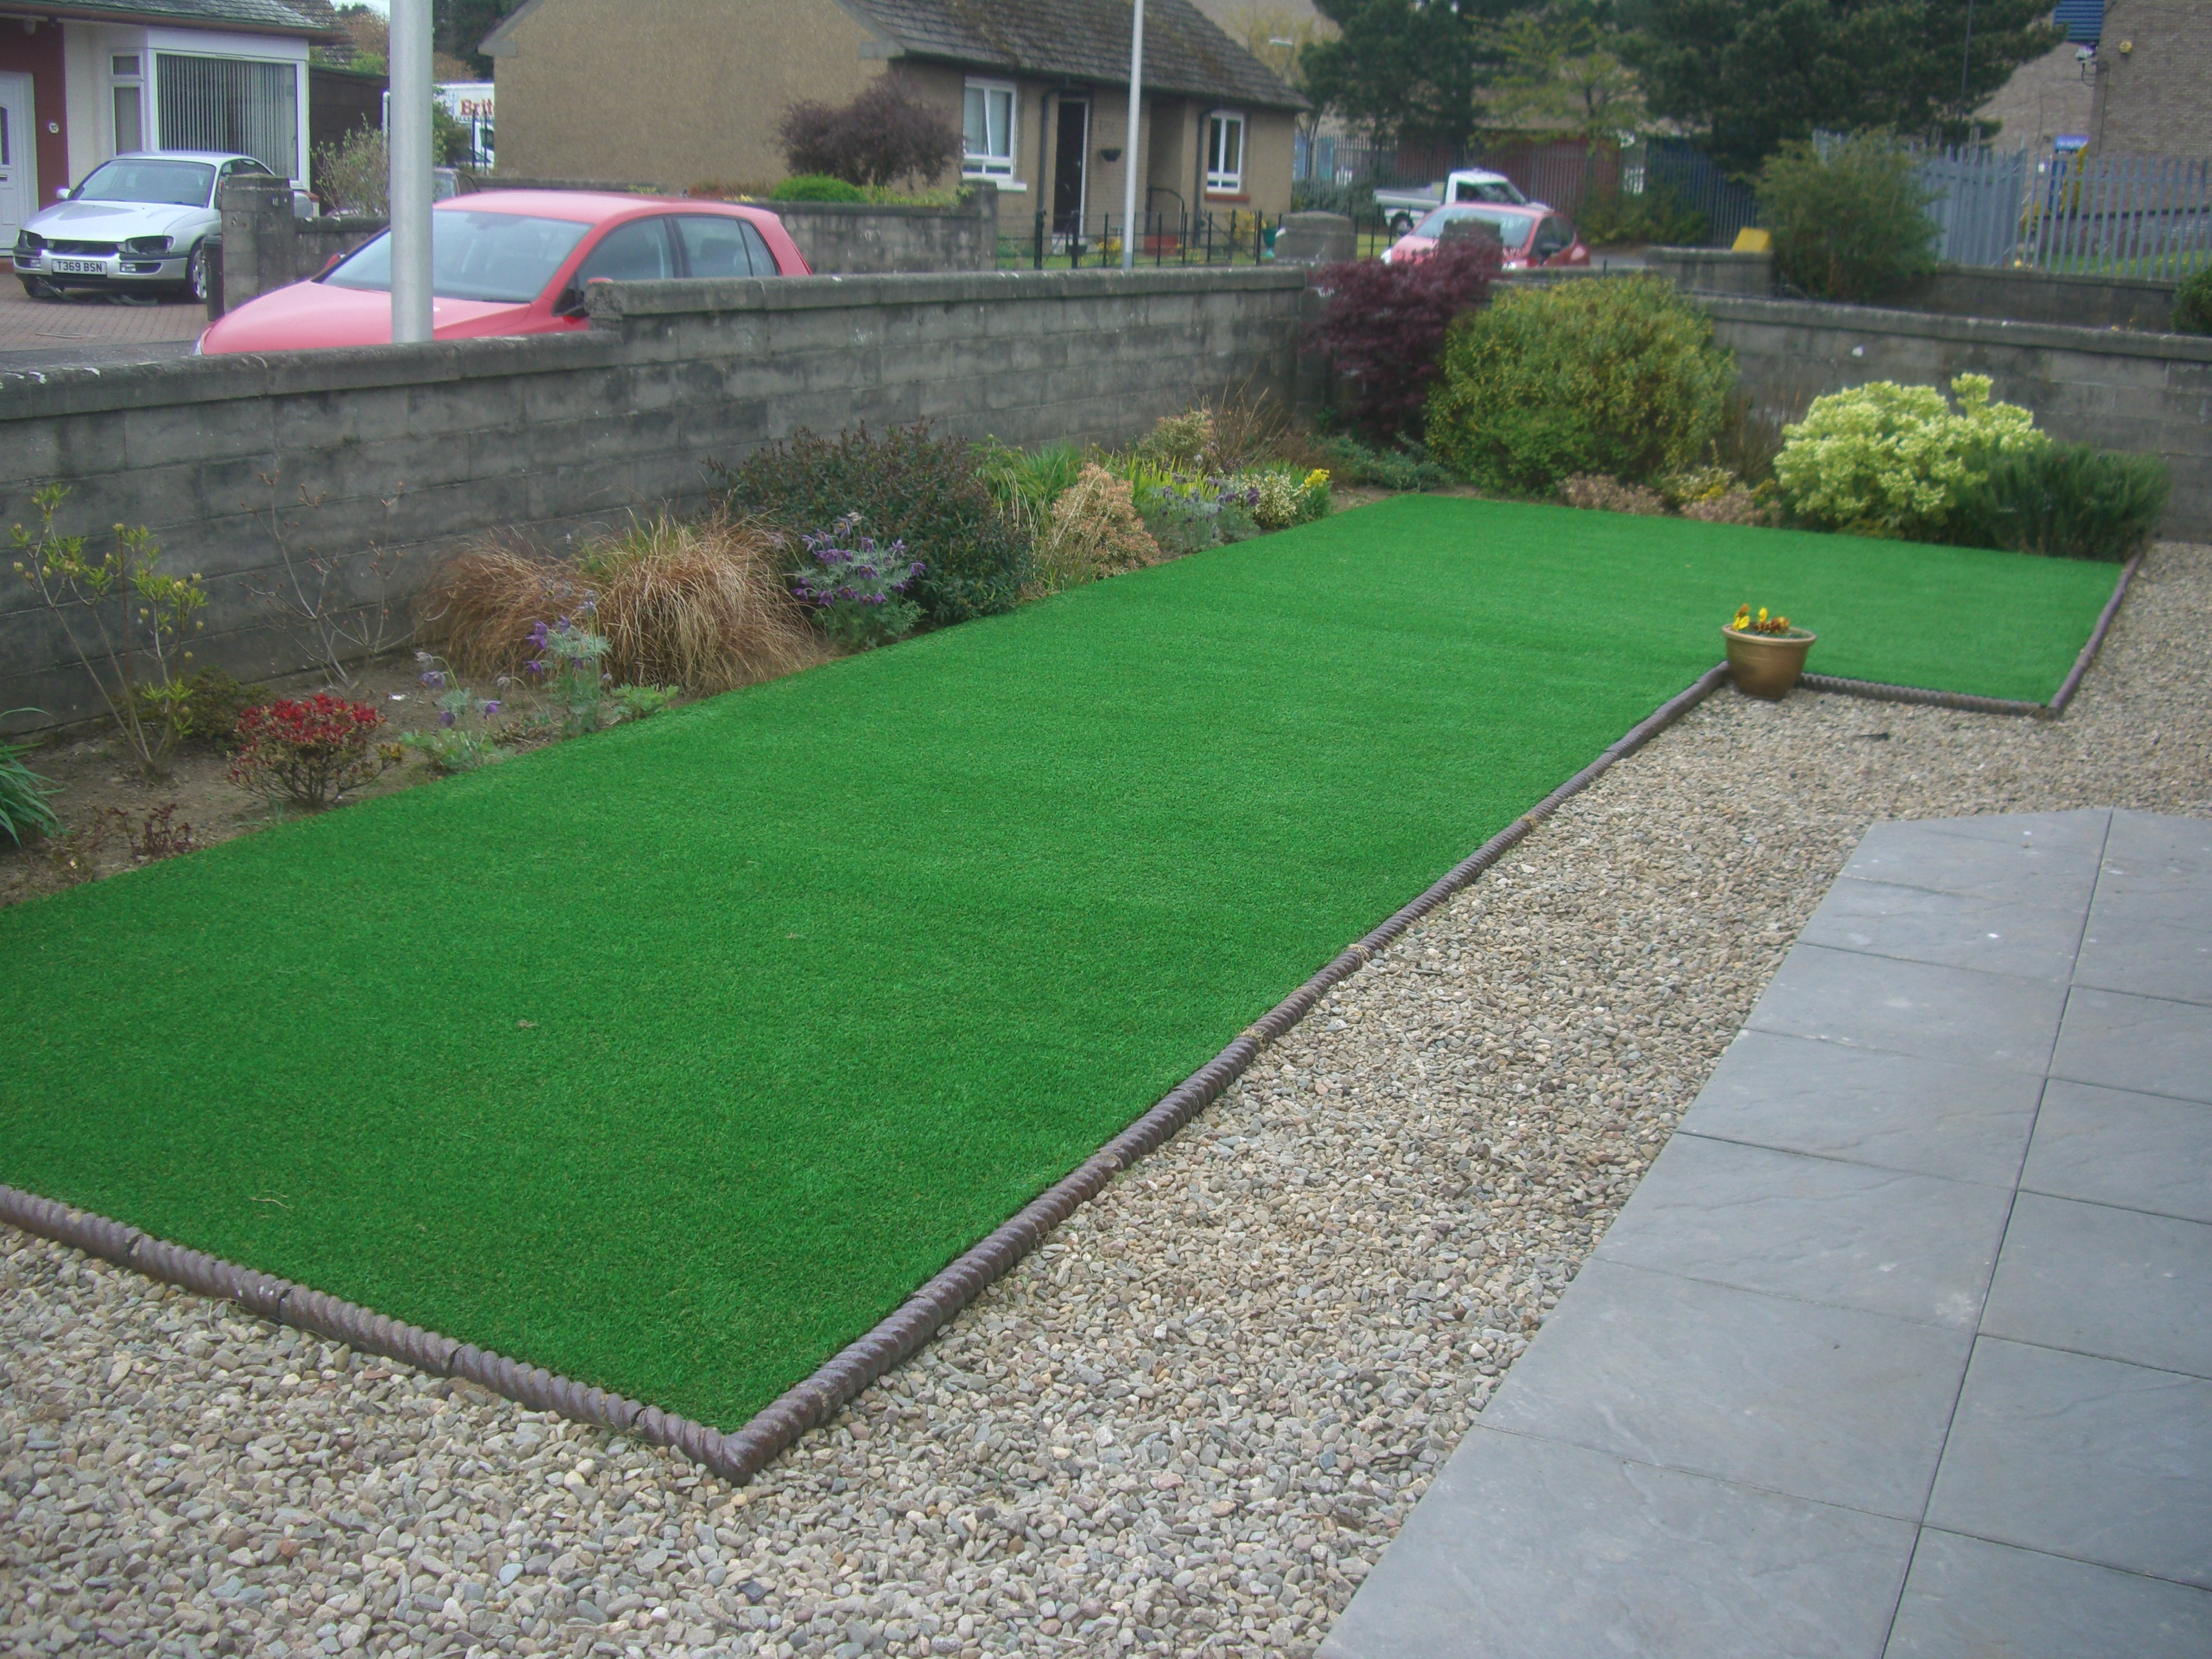 Gallery of EaziLawn Artificial Grass Installation - Eazilawn